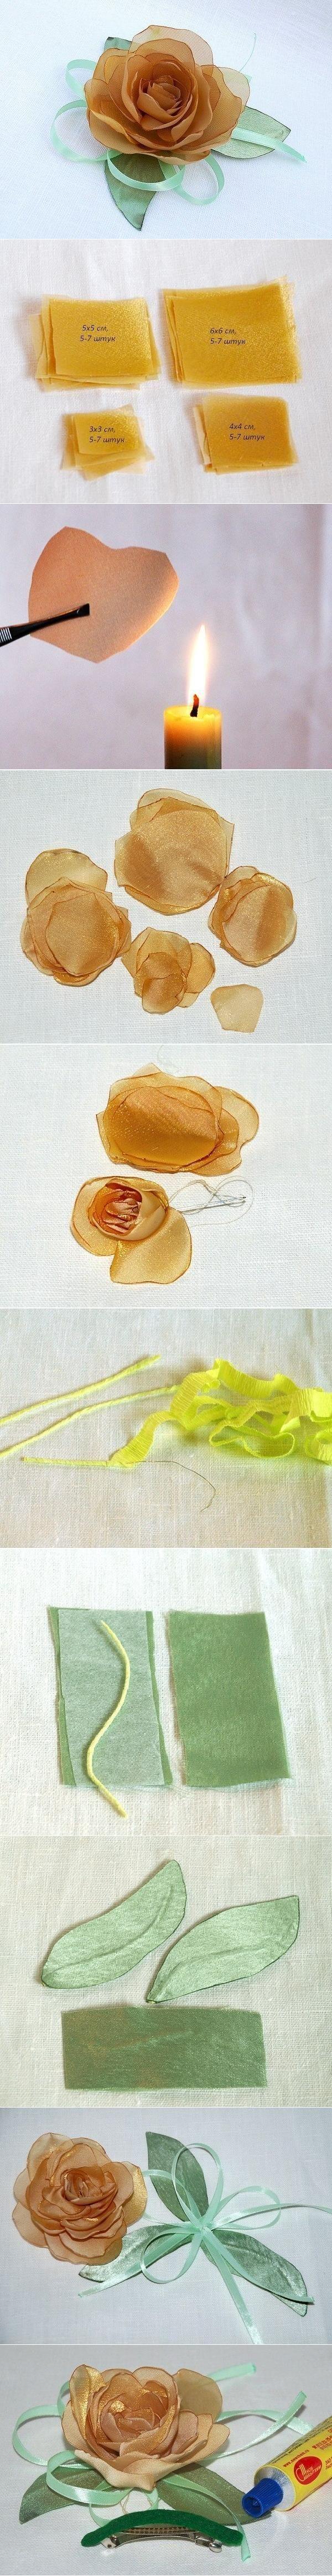 DIY Pretty Hairpin Rose